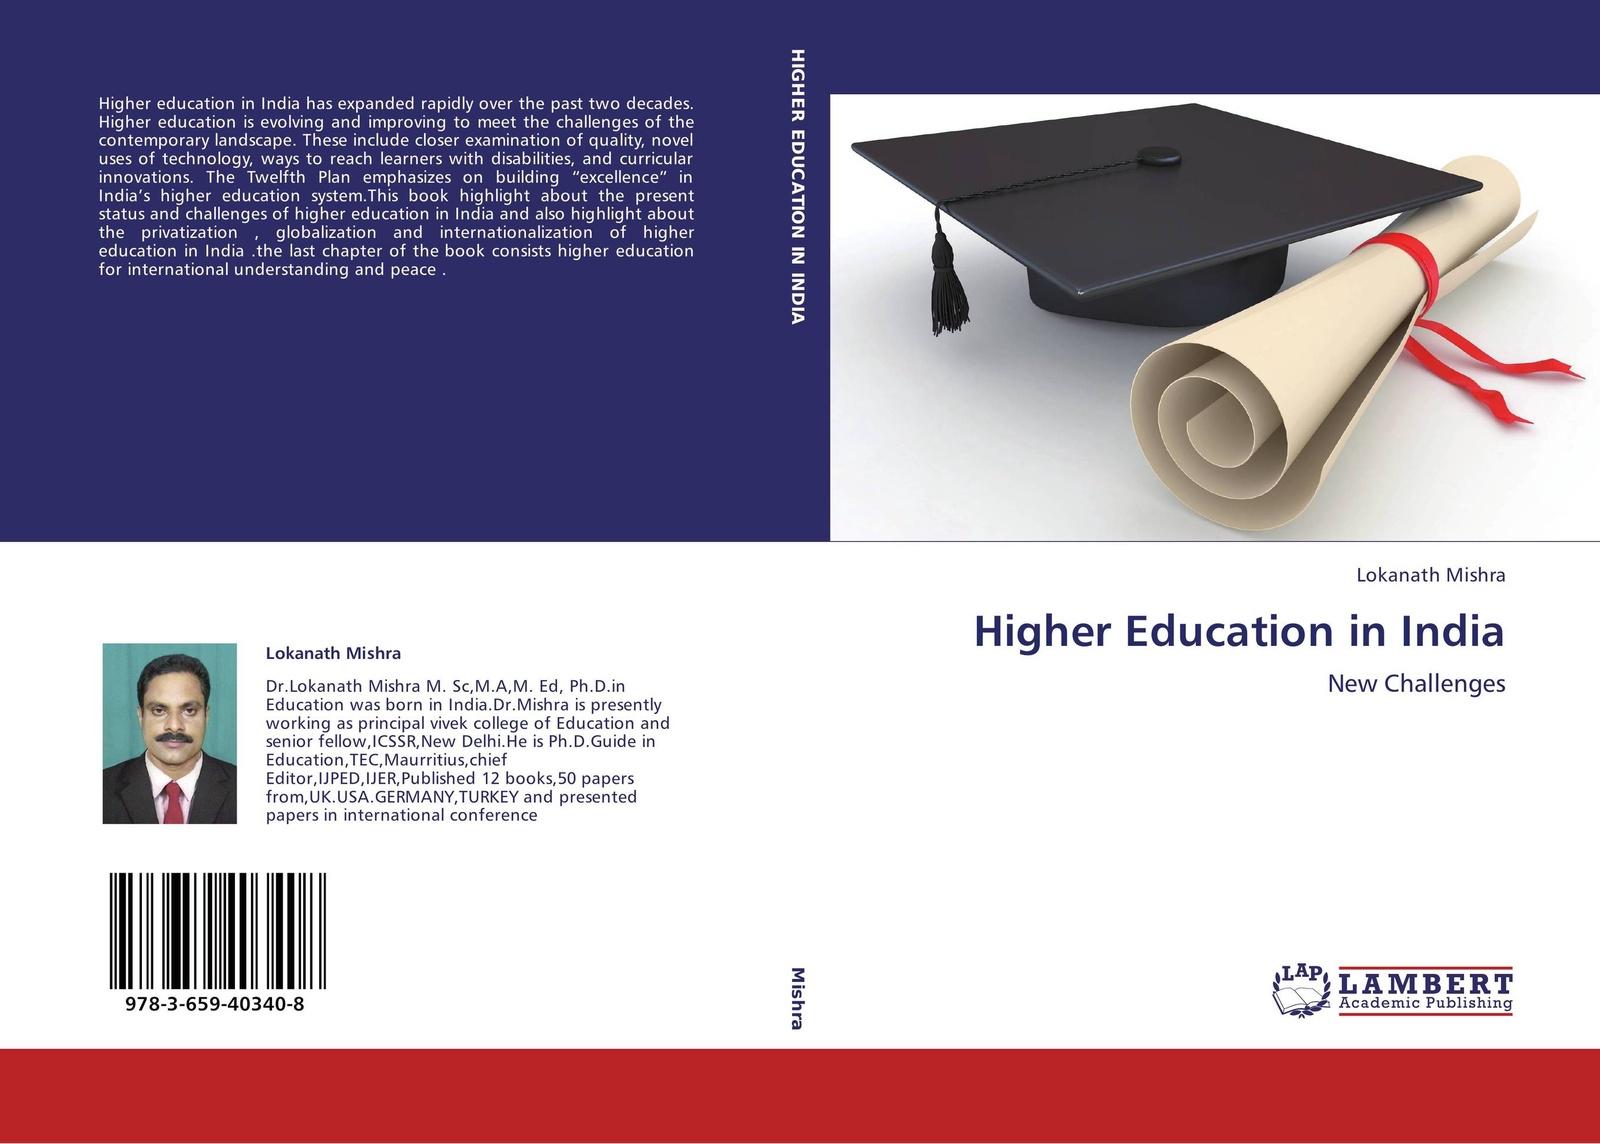 Lokanath Mishra Higher Education in India mario c martinez mimi wolverton innovative strategy making in higher education pb